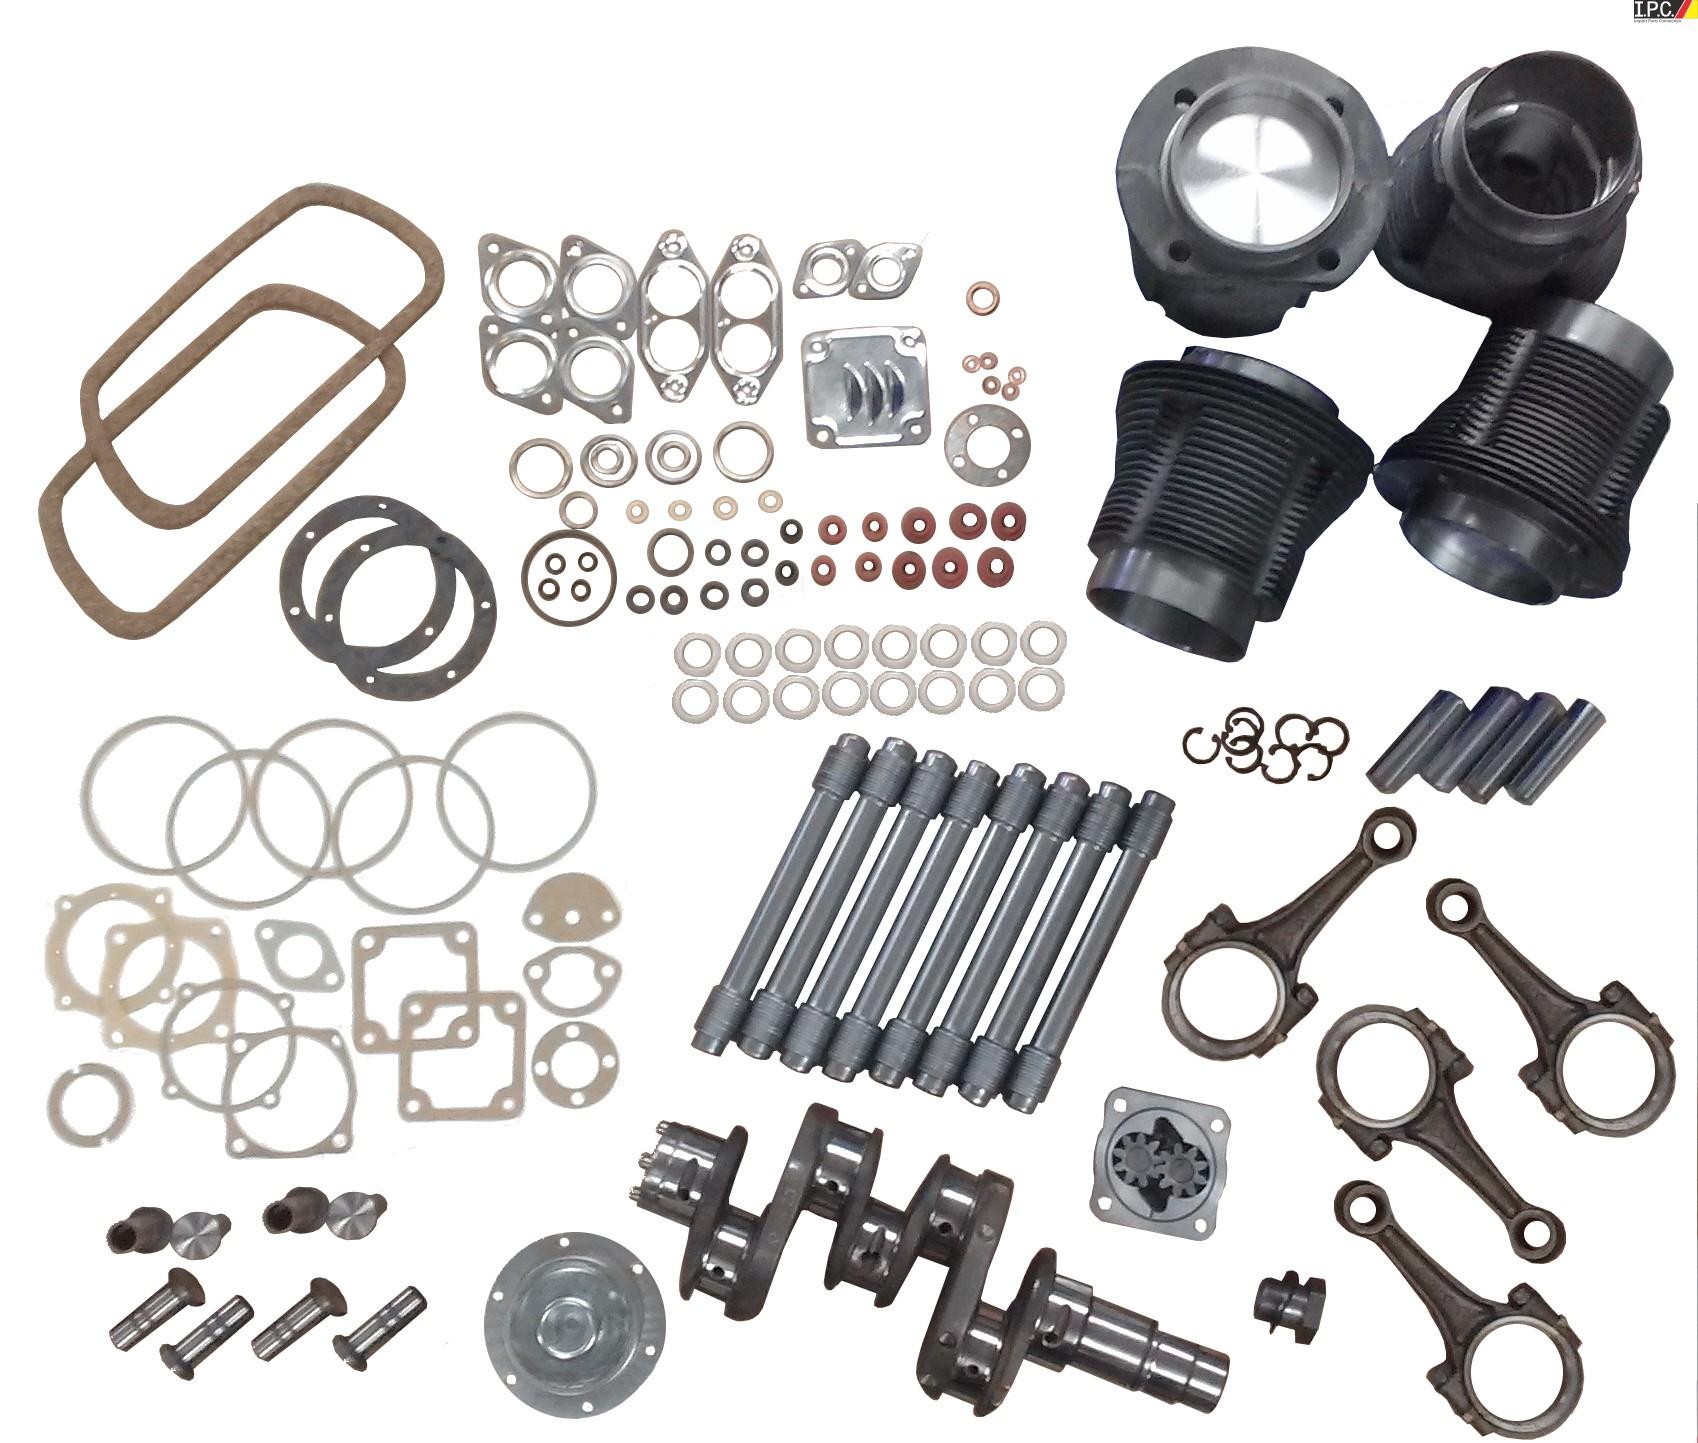 Vw 1600 Connecting Rods: Engine Rebuild Kit For 1600cc Engines. I.P.C. VW Parts, VW